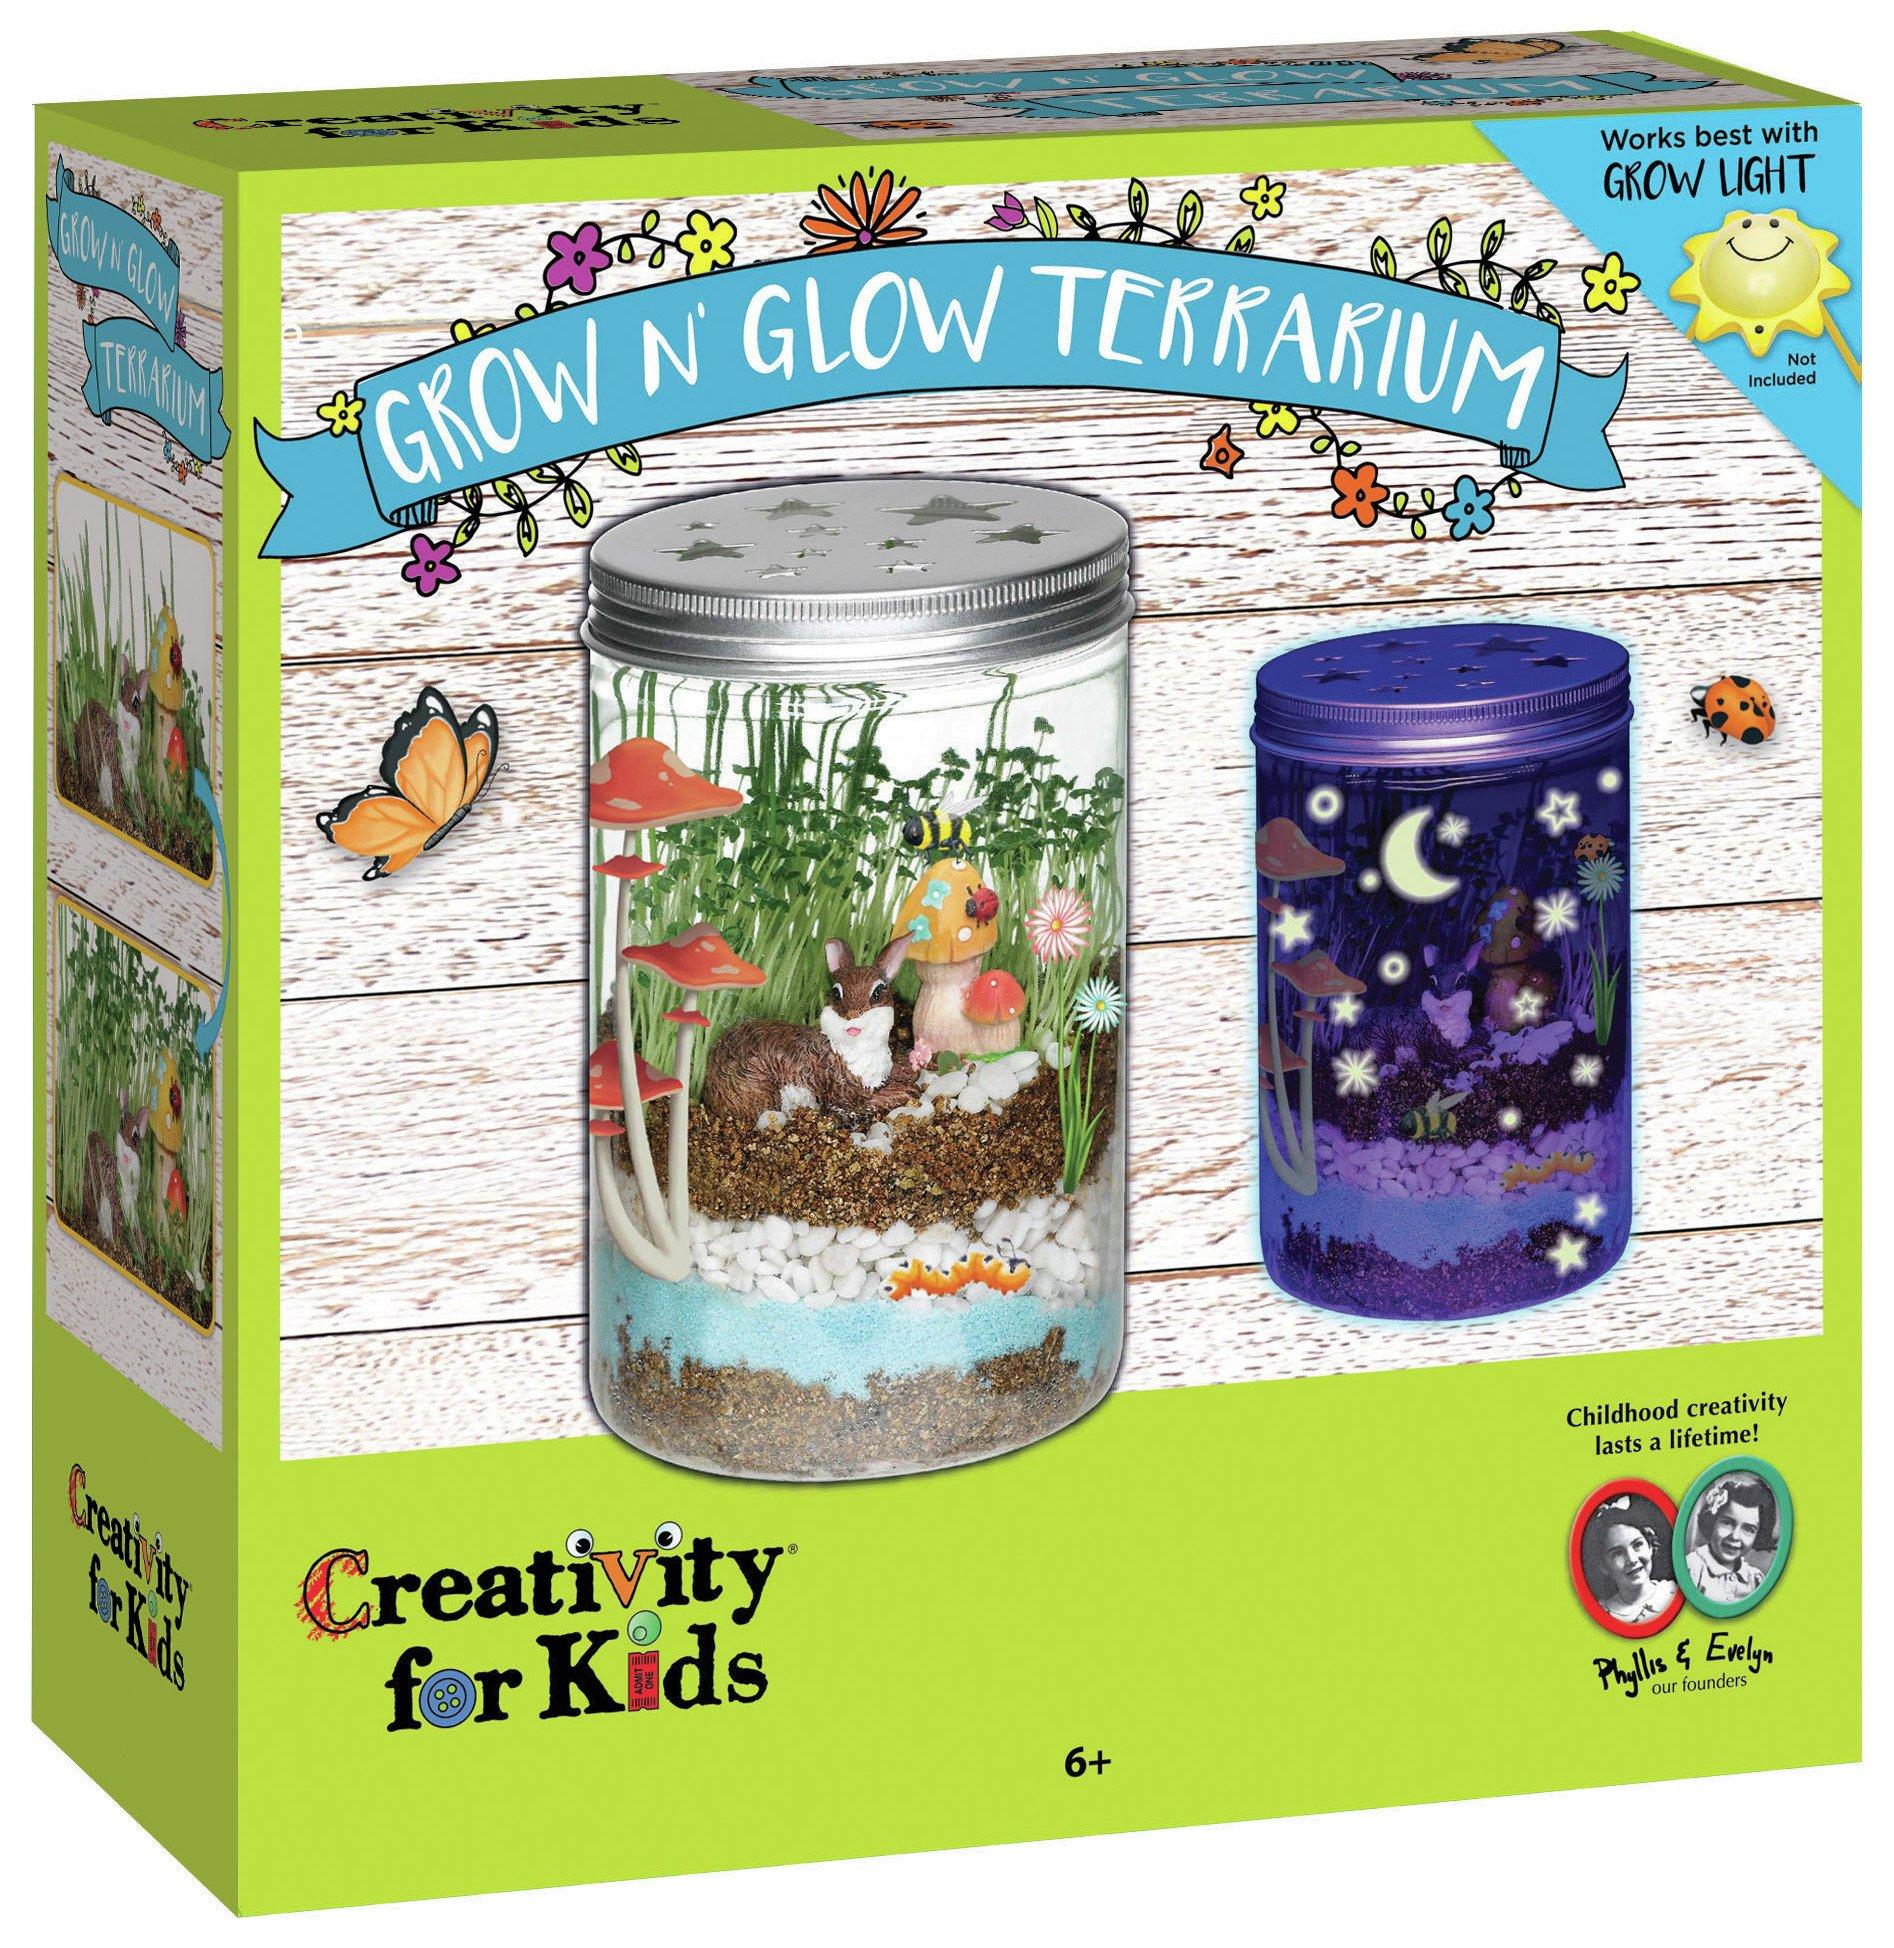 Image of Creativity for Kids GROW N' Glow Terrarium Set.